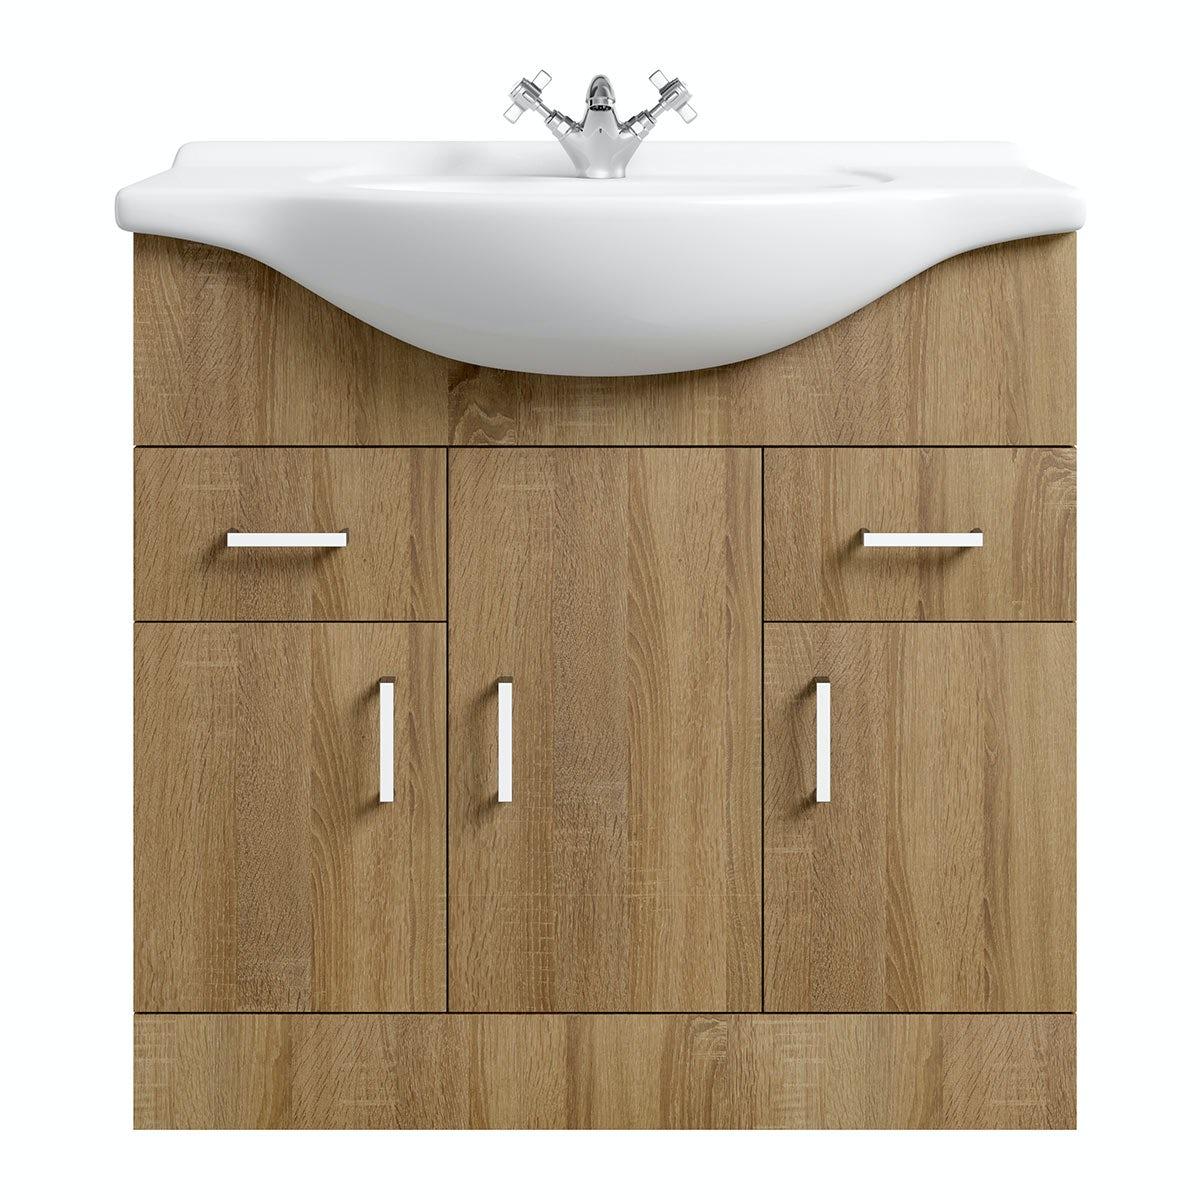 Superb Sienna Oak 85 Vanity Unit U0026 Basin